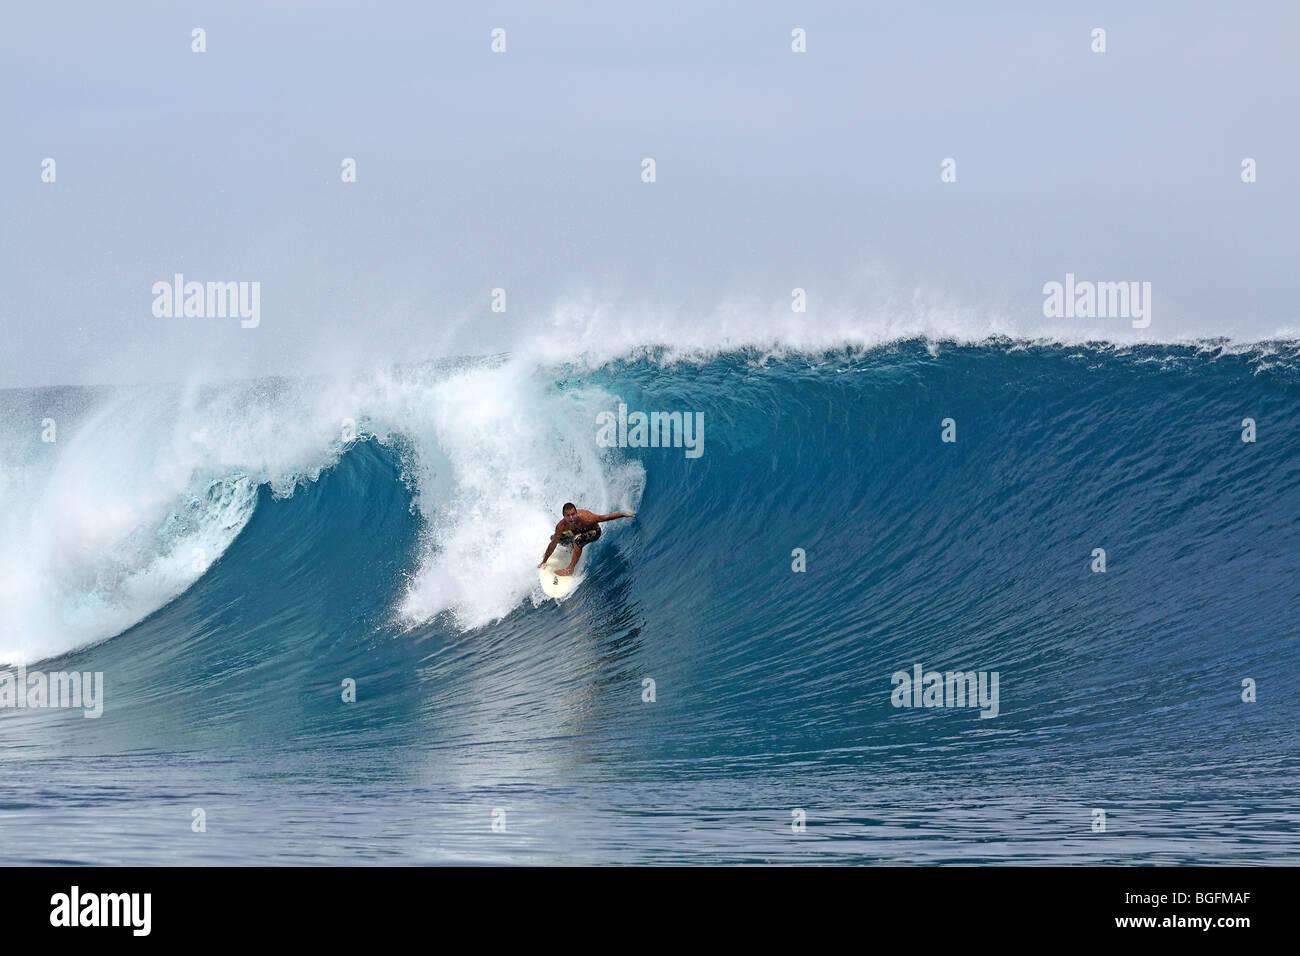 Surfing a large wave. Mentawai Islands, Sumatra, Indonesia, Southeast Asia, Asia - Stock Image